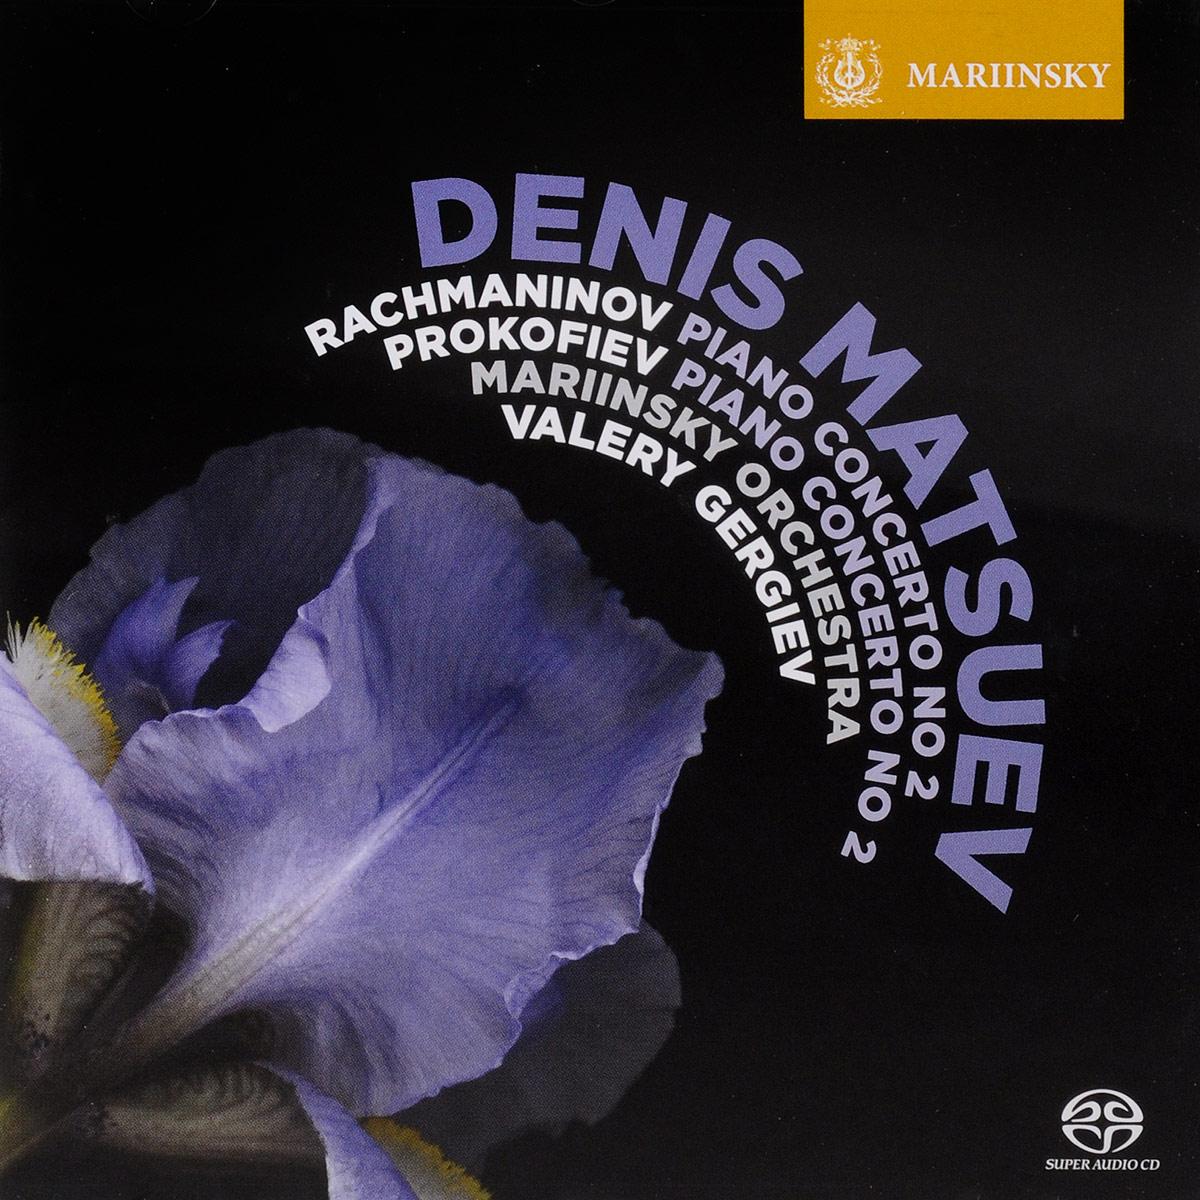 Denis Matsuev, Mariinsky Orchestra, Valery Gergiev. Rachmaninov: Piano Concerto No. 2 - Prokofiev: Piano Concerto No. 2 (SACD) денис мацуев valery gergiev denis matsuev rachmaninov rhapsody on a theme of paganini piano concerto 3